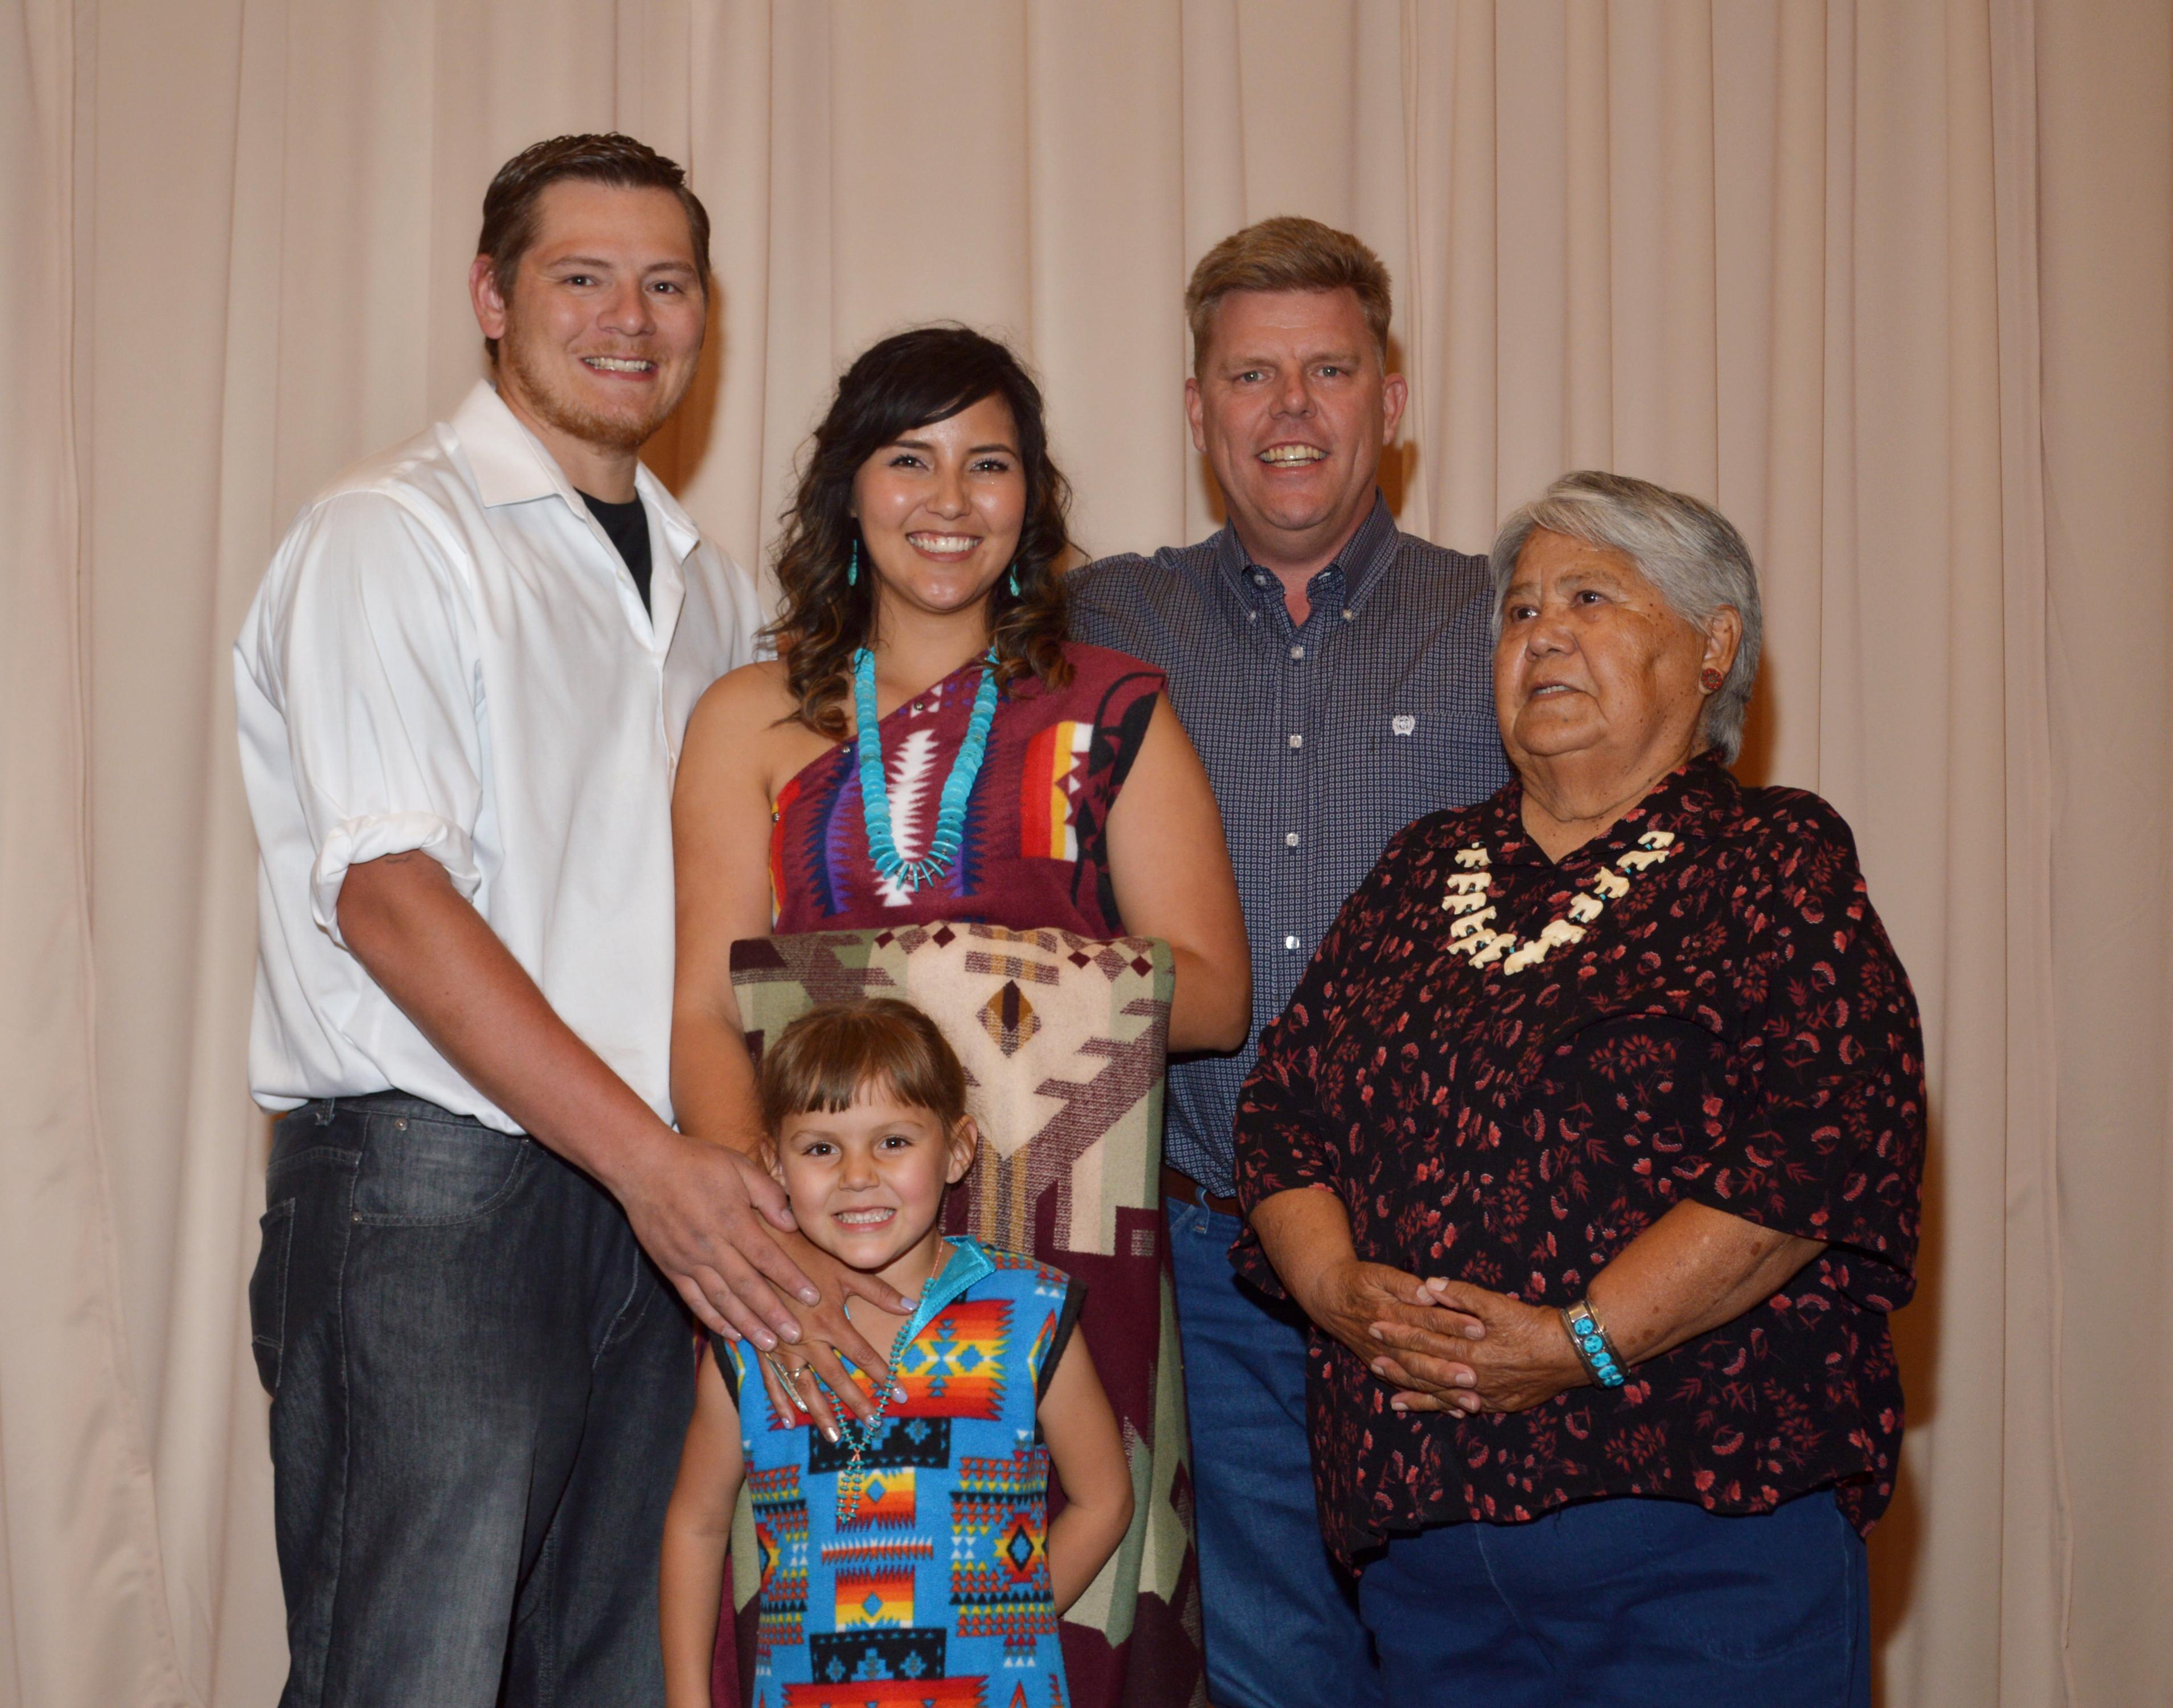 Ariel Hautzinger, BSN & Familie